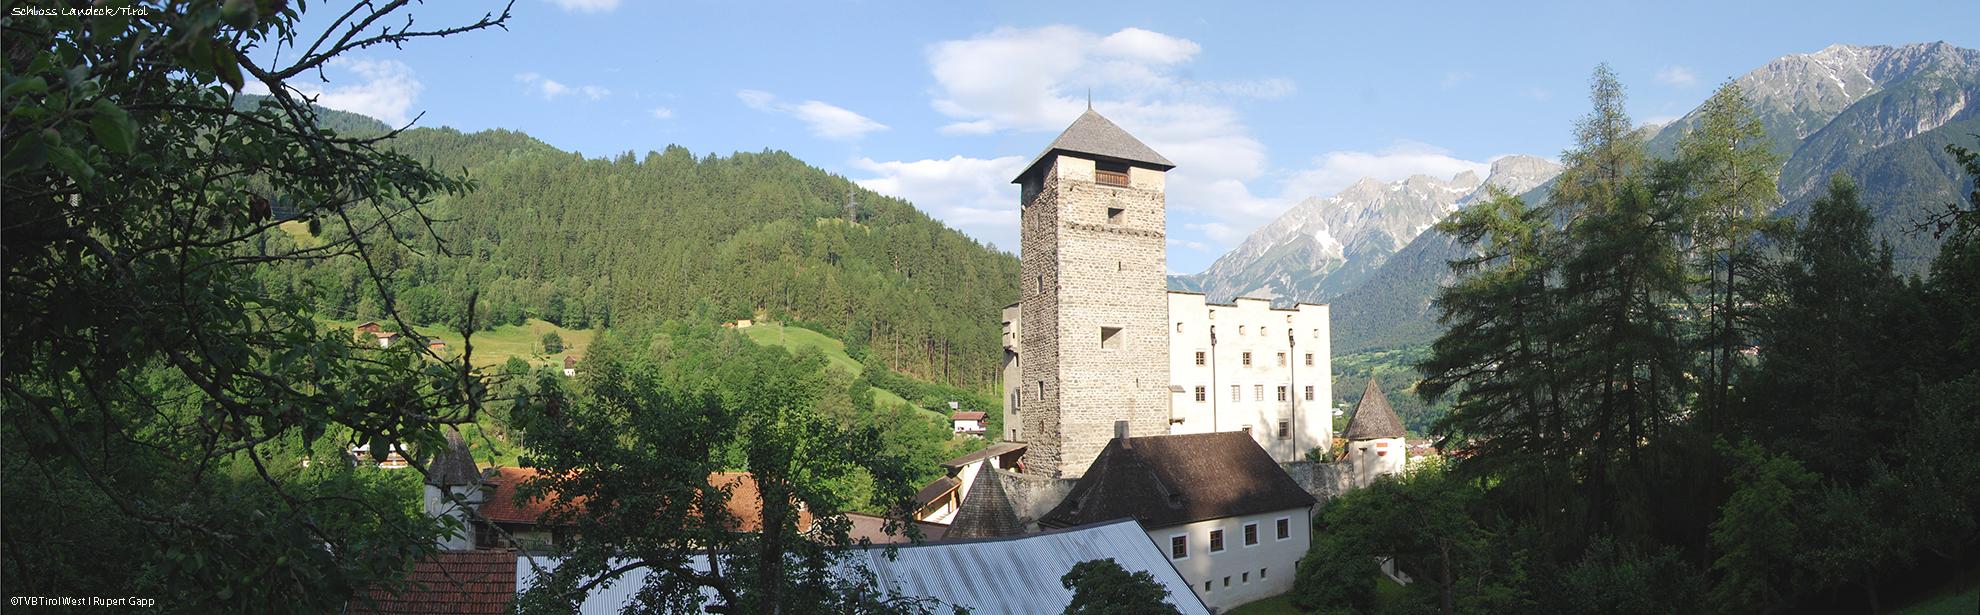 OklassArchiv-TVB-TirolWest-Rupert-Gapp_Schloss-Landeck